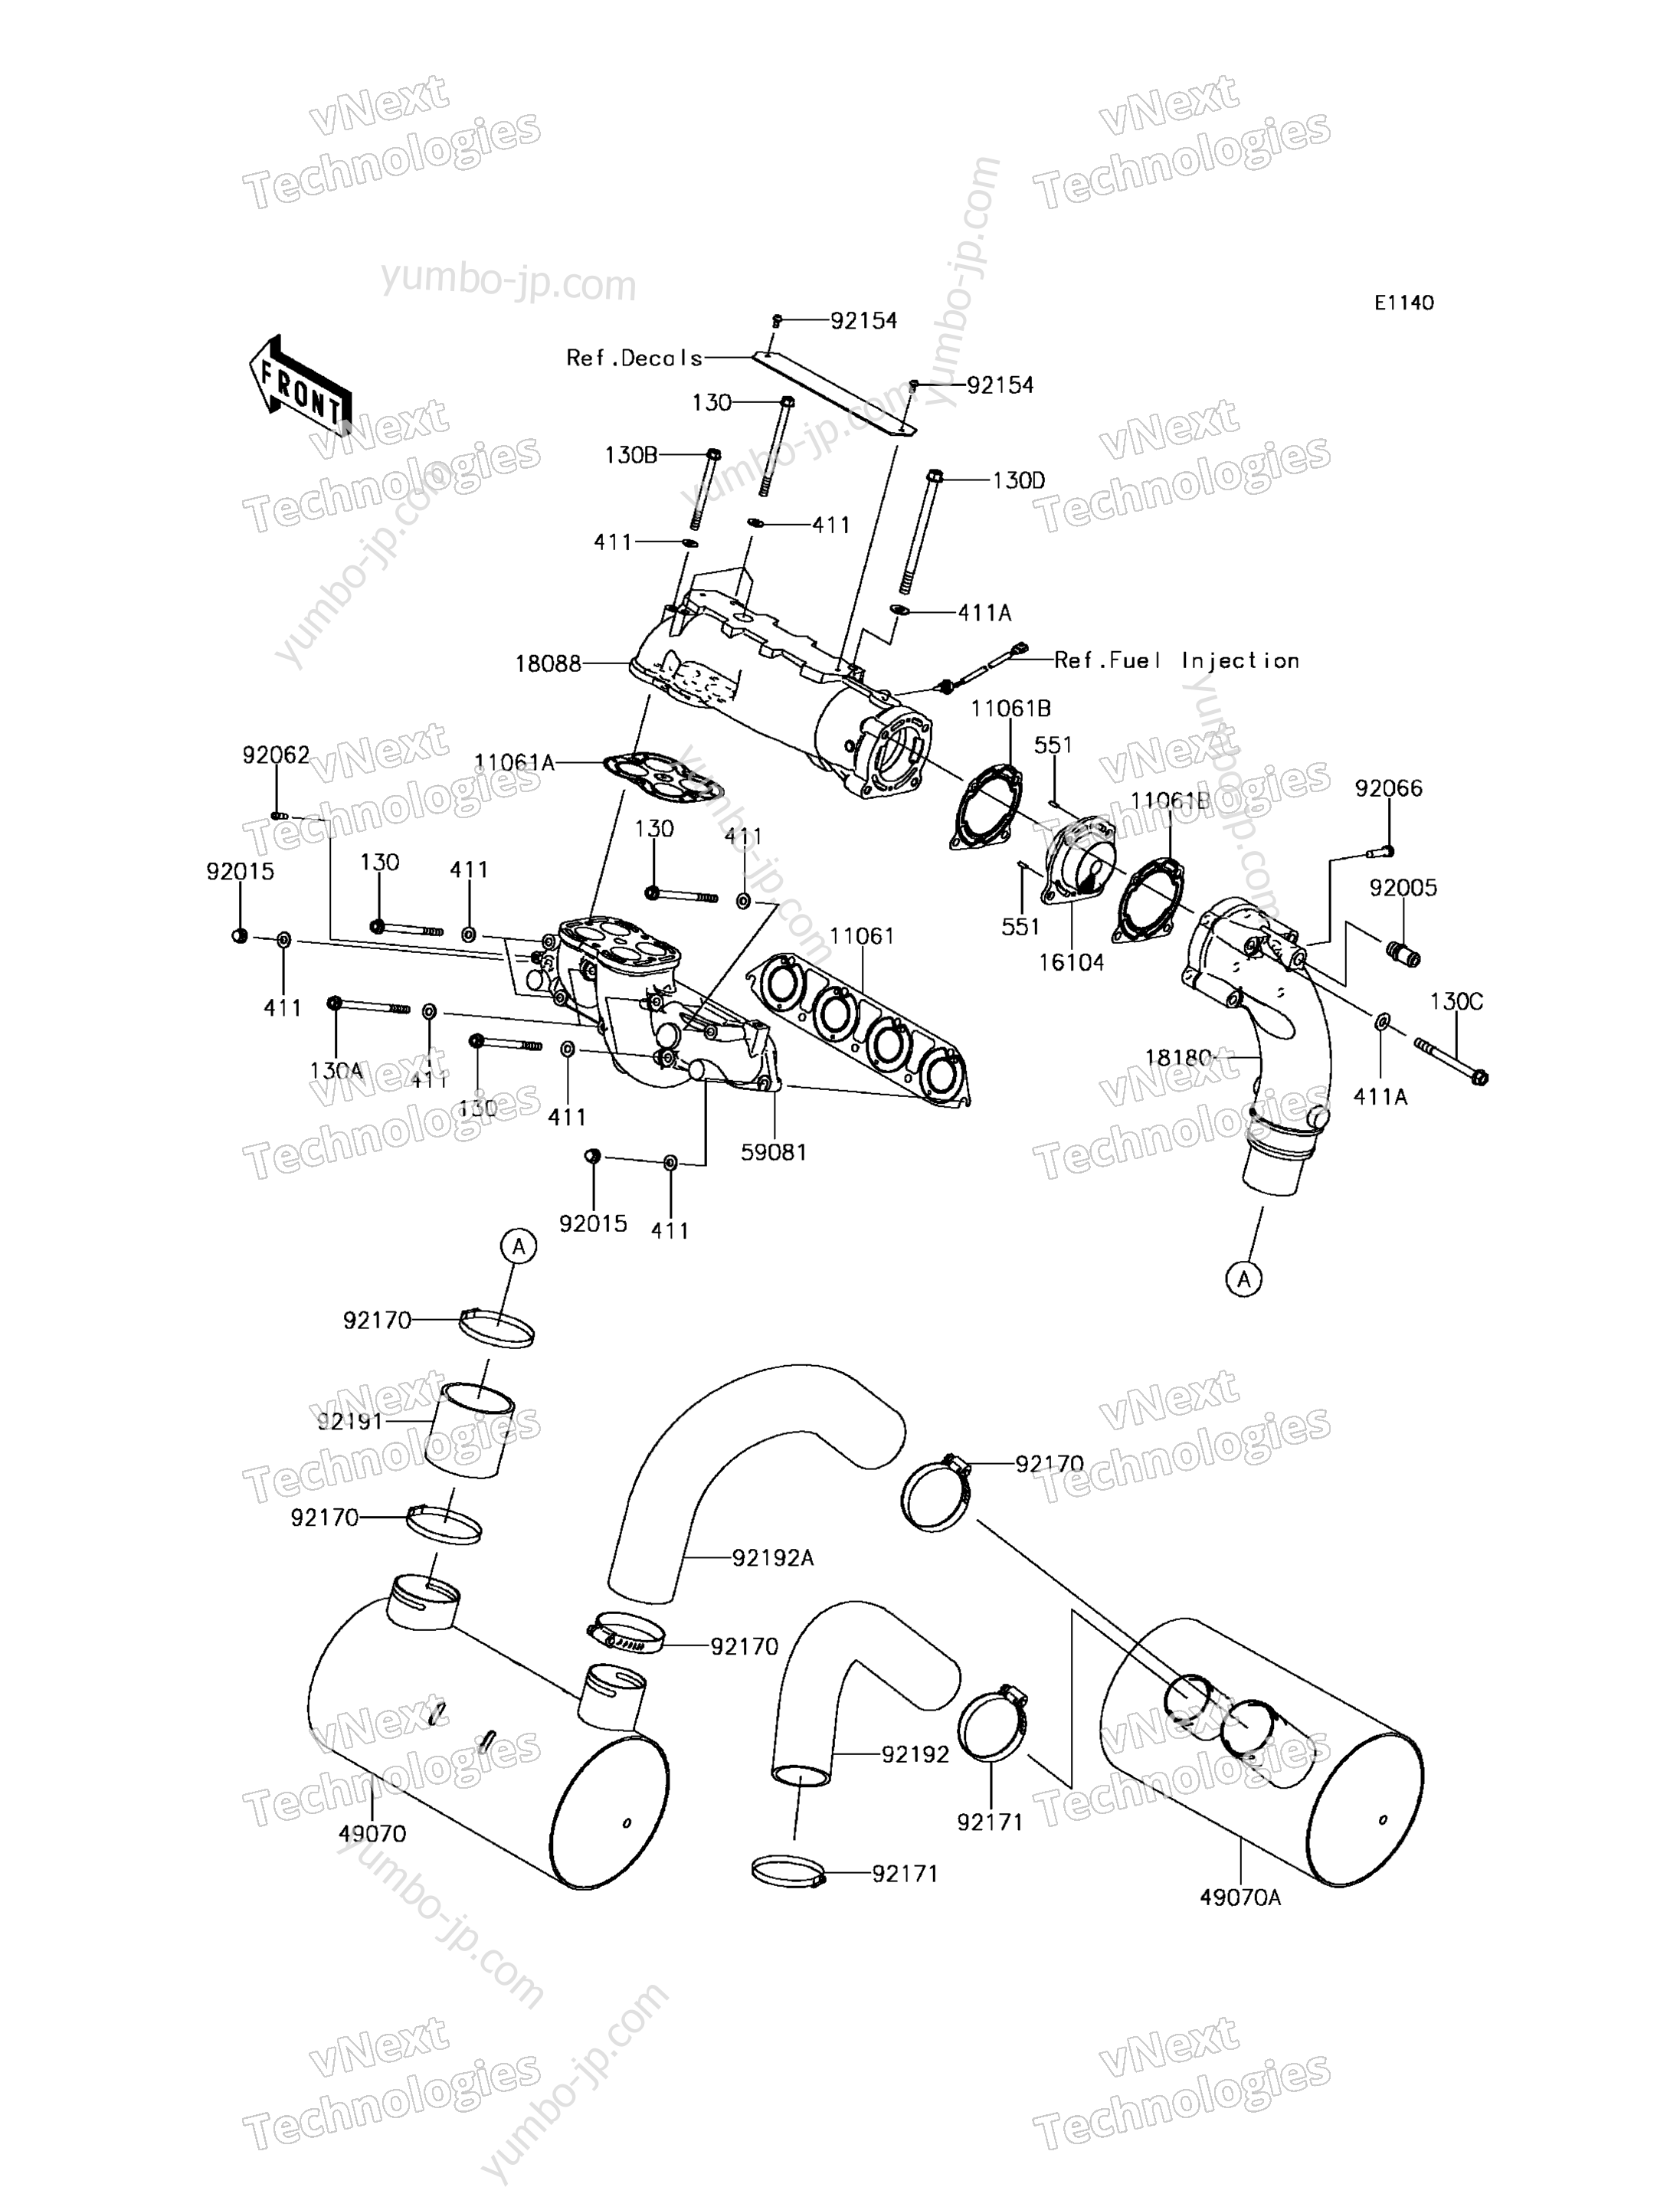 Muffler(s) для гидроциклов KAWASAKI JET SKI ULTRA 310X (JT1500PGF) 2016 г.